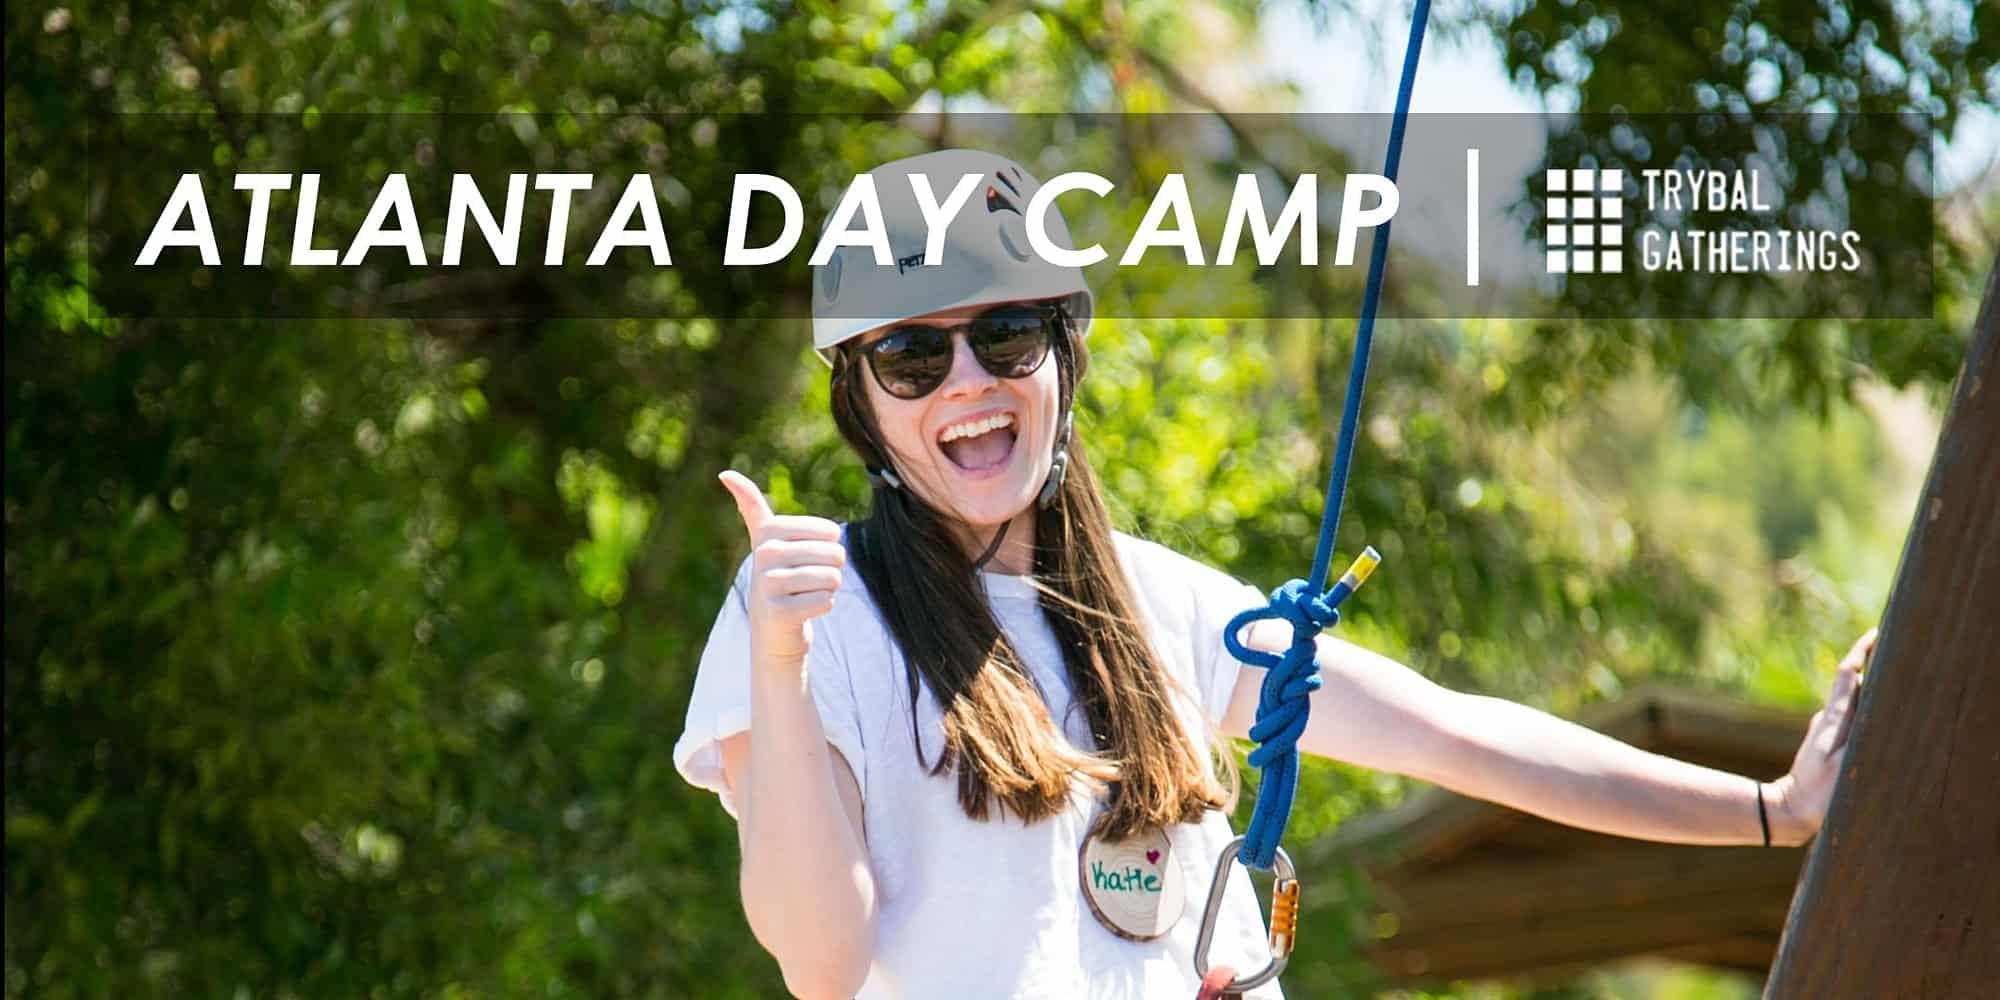 Trybal Gatherings | Atlanta Day Camp 2021